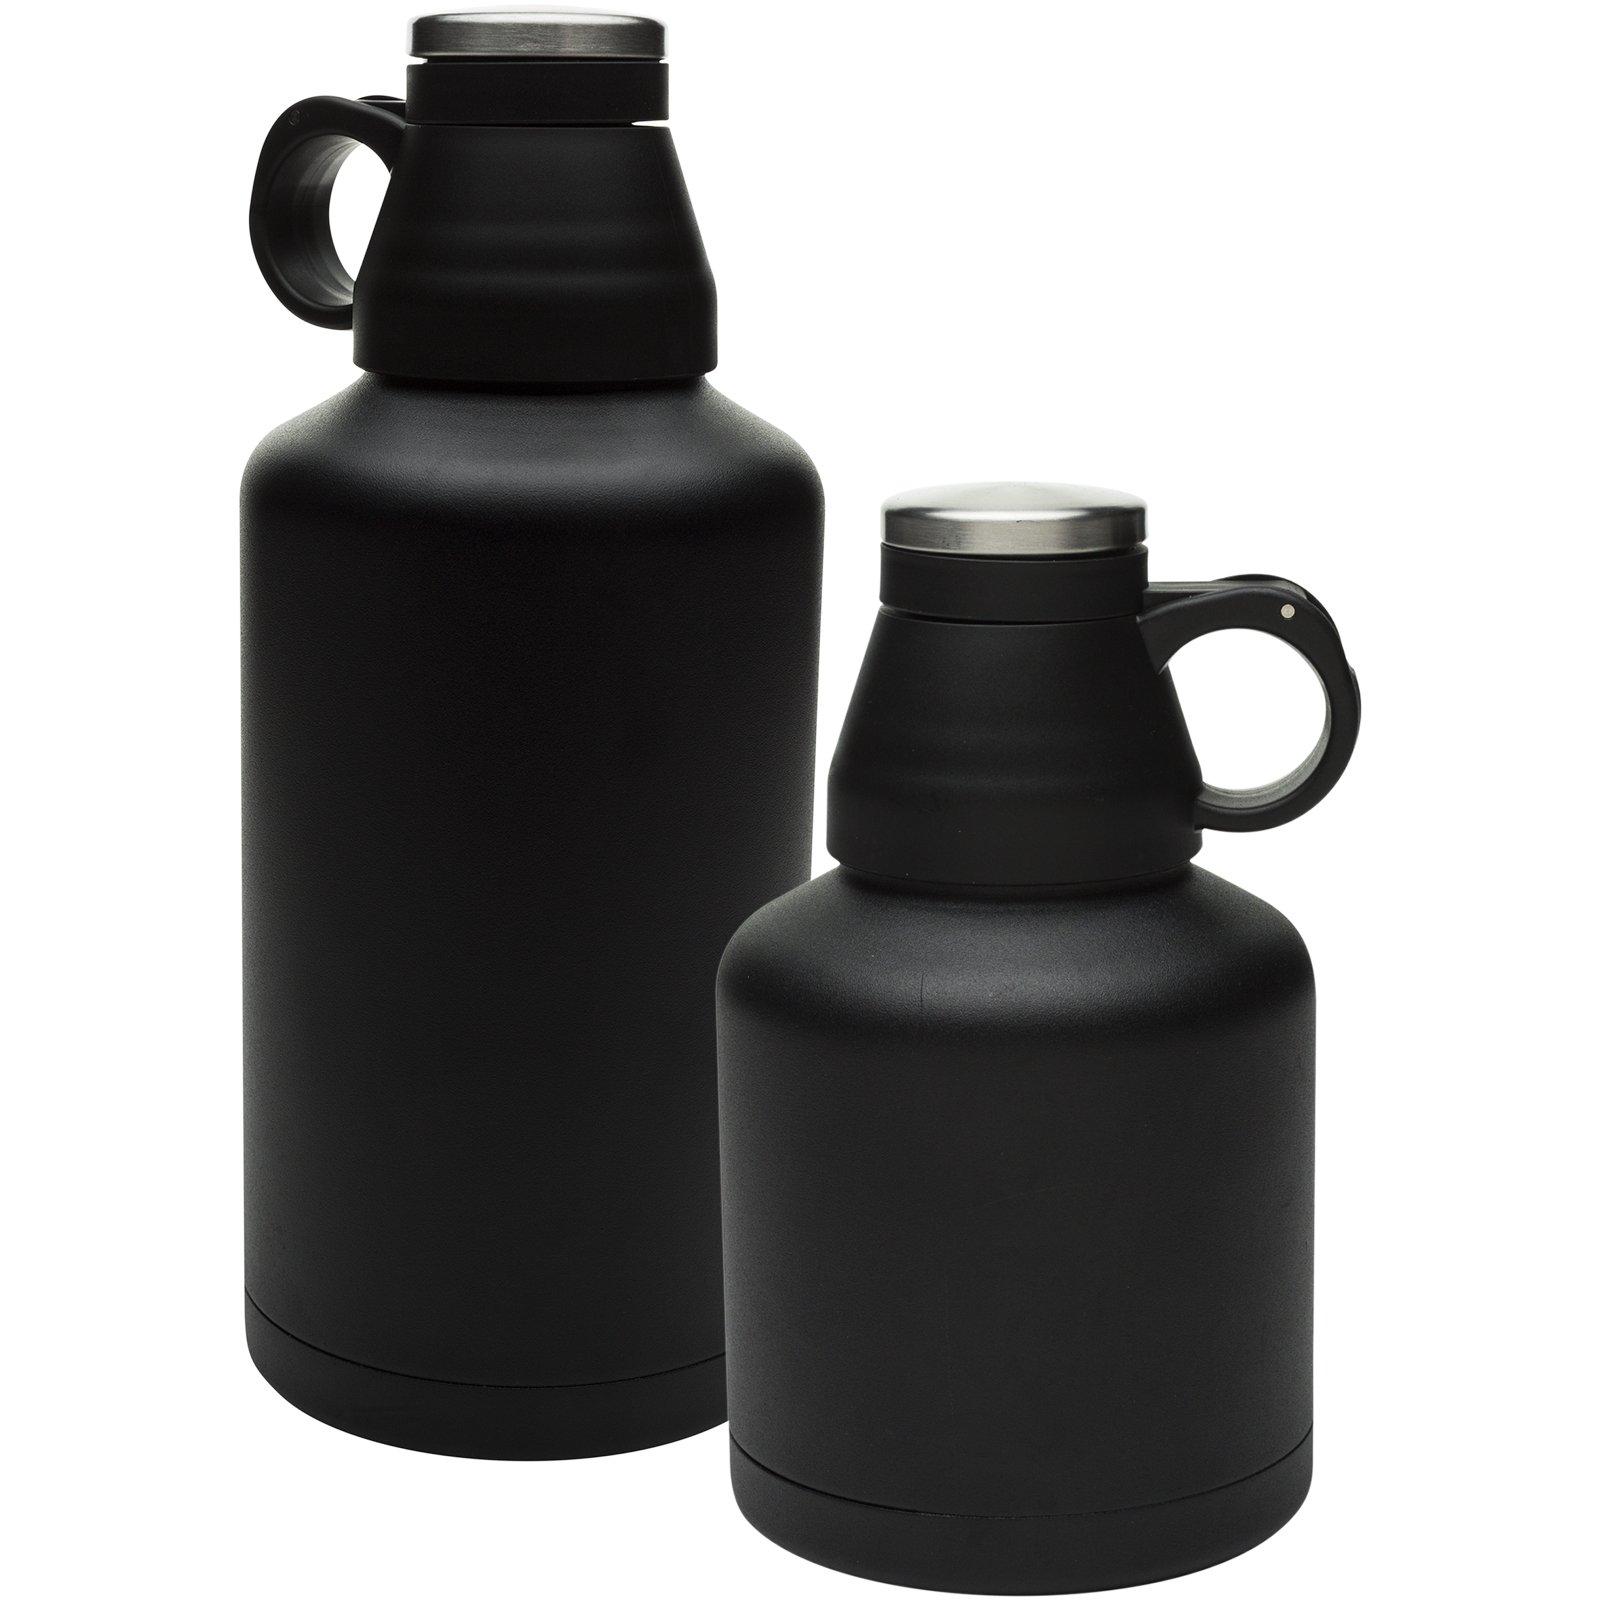 Zak Designs Arcadia 64 oz. Double-Wall Vacuum Insulated Growler, Black, 2 piece set